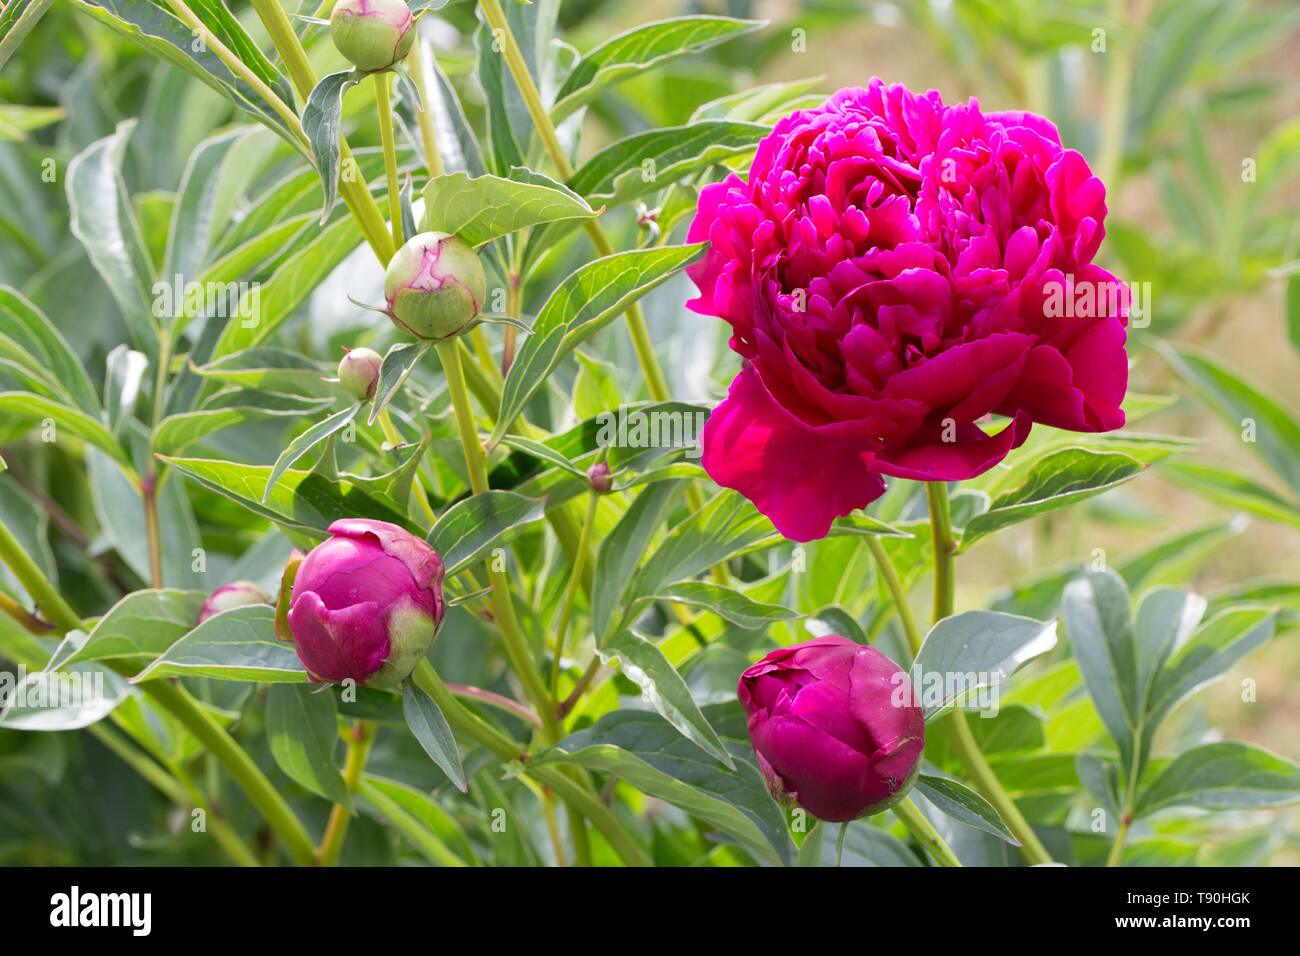 Magenta peony flower head in garden with green - Stock Image